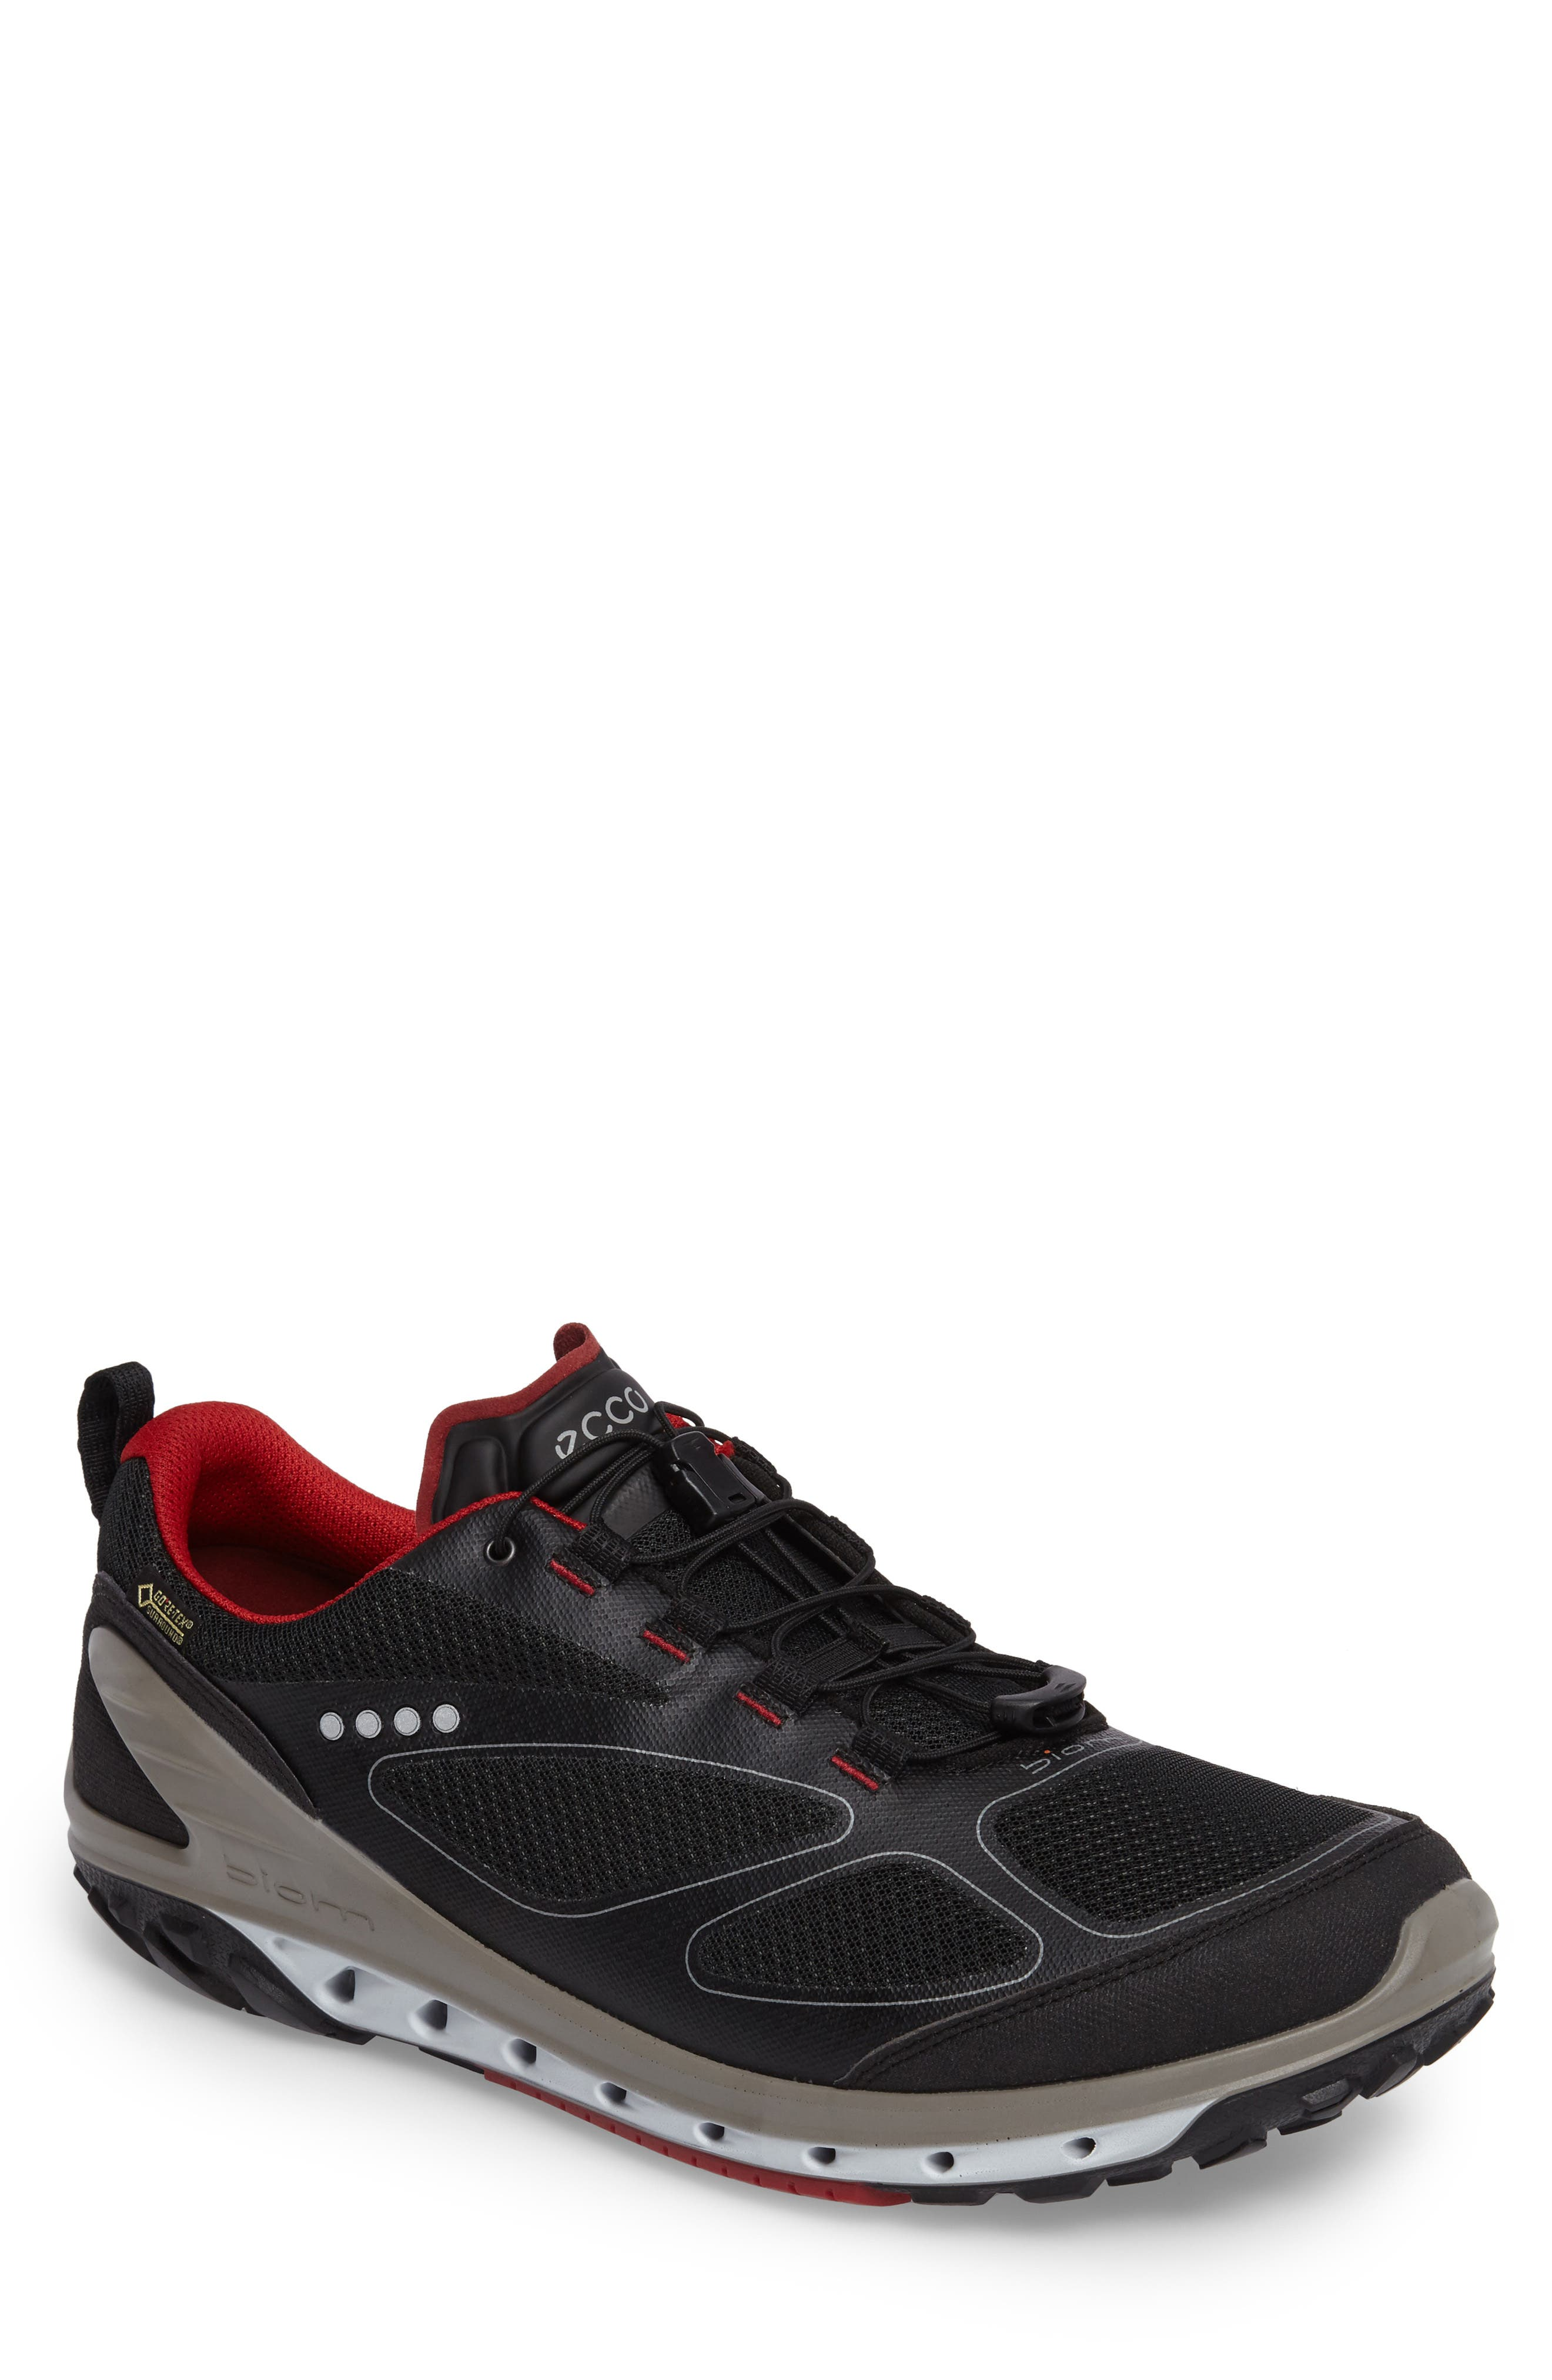 Main Image - ECCO Biom Venture GTX Sneaker (Men)